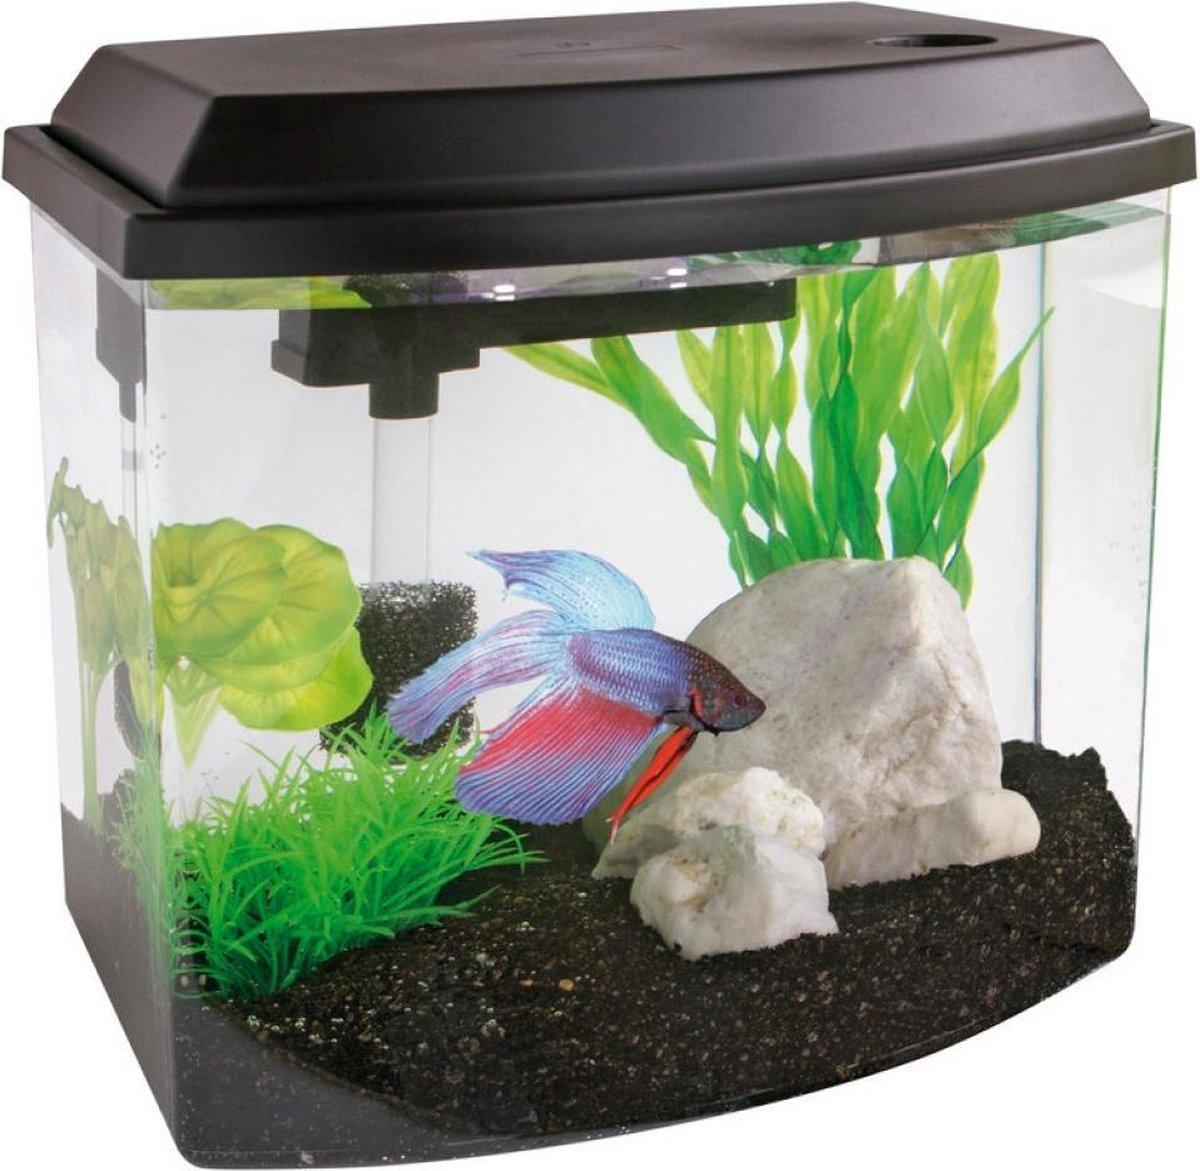 Superfish cascade Aquarium - 25x15x21.5 cm - 9.5L - Zwart - SuperFish